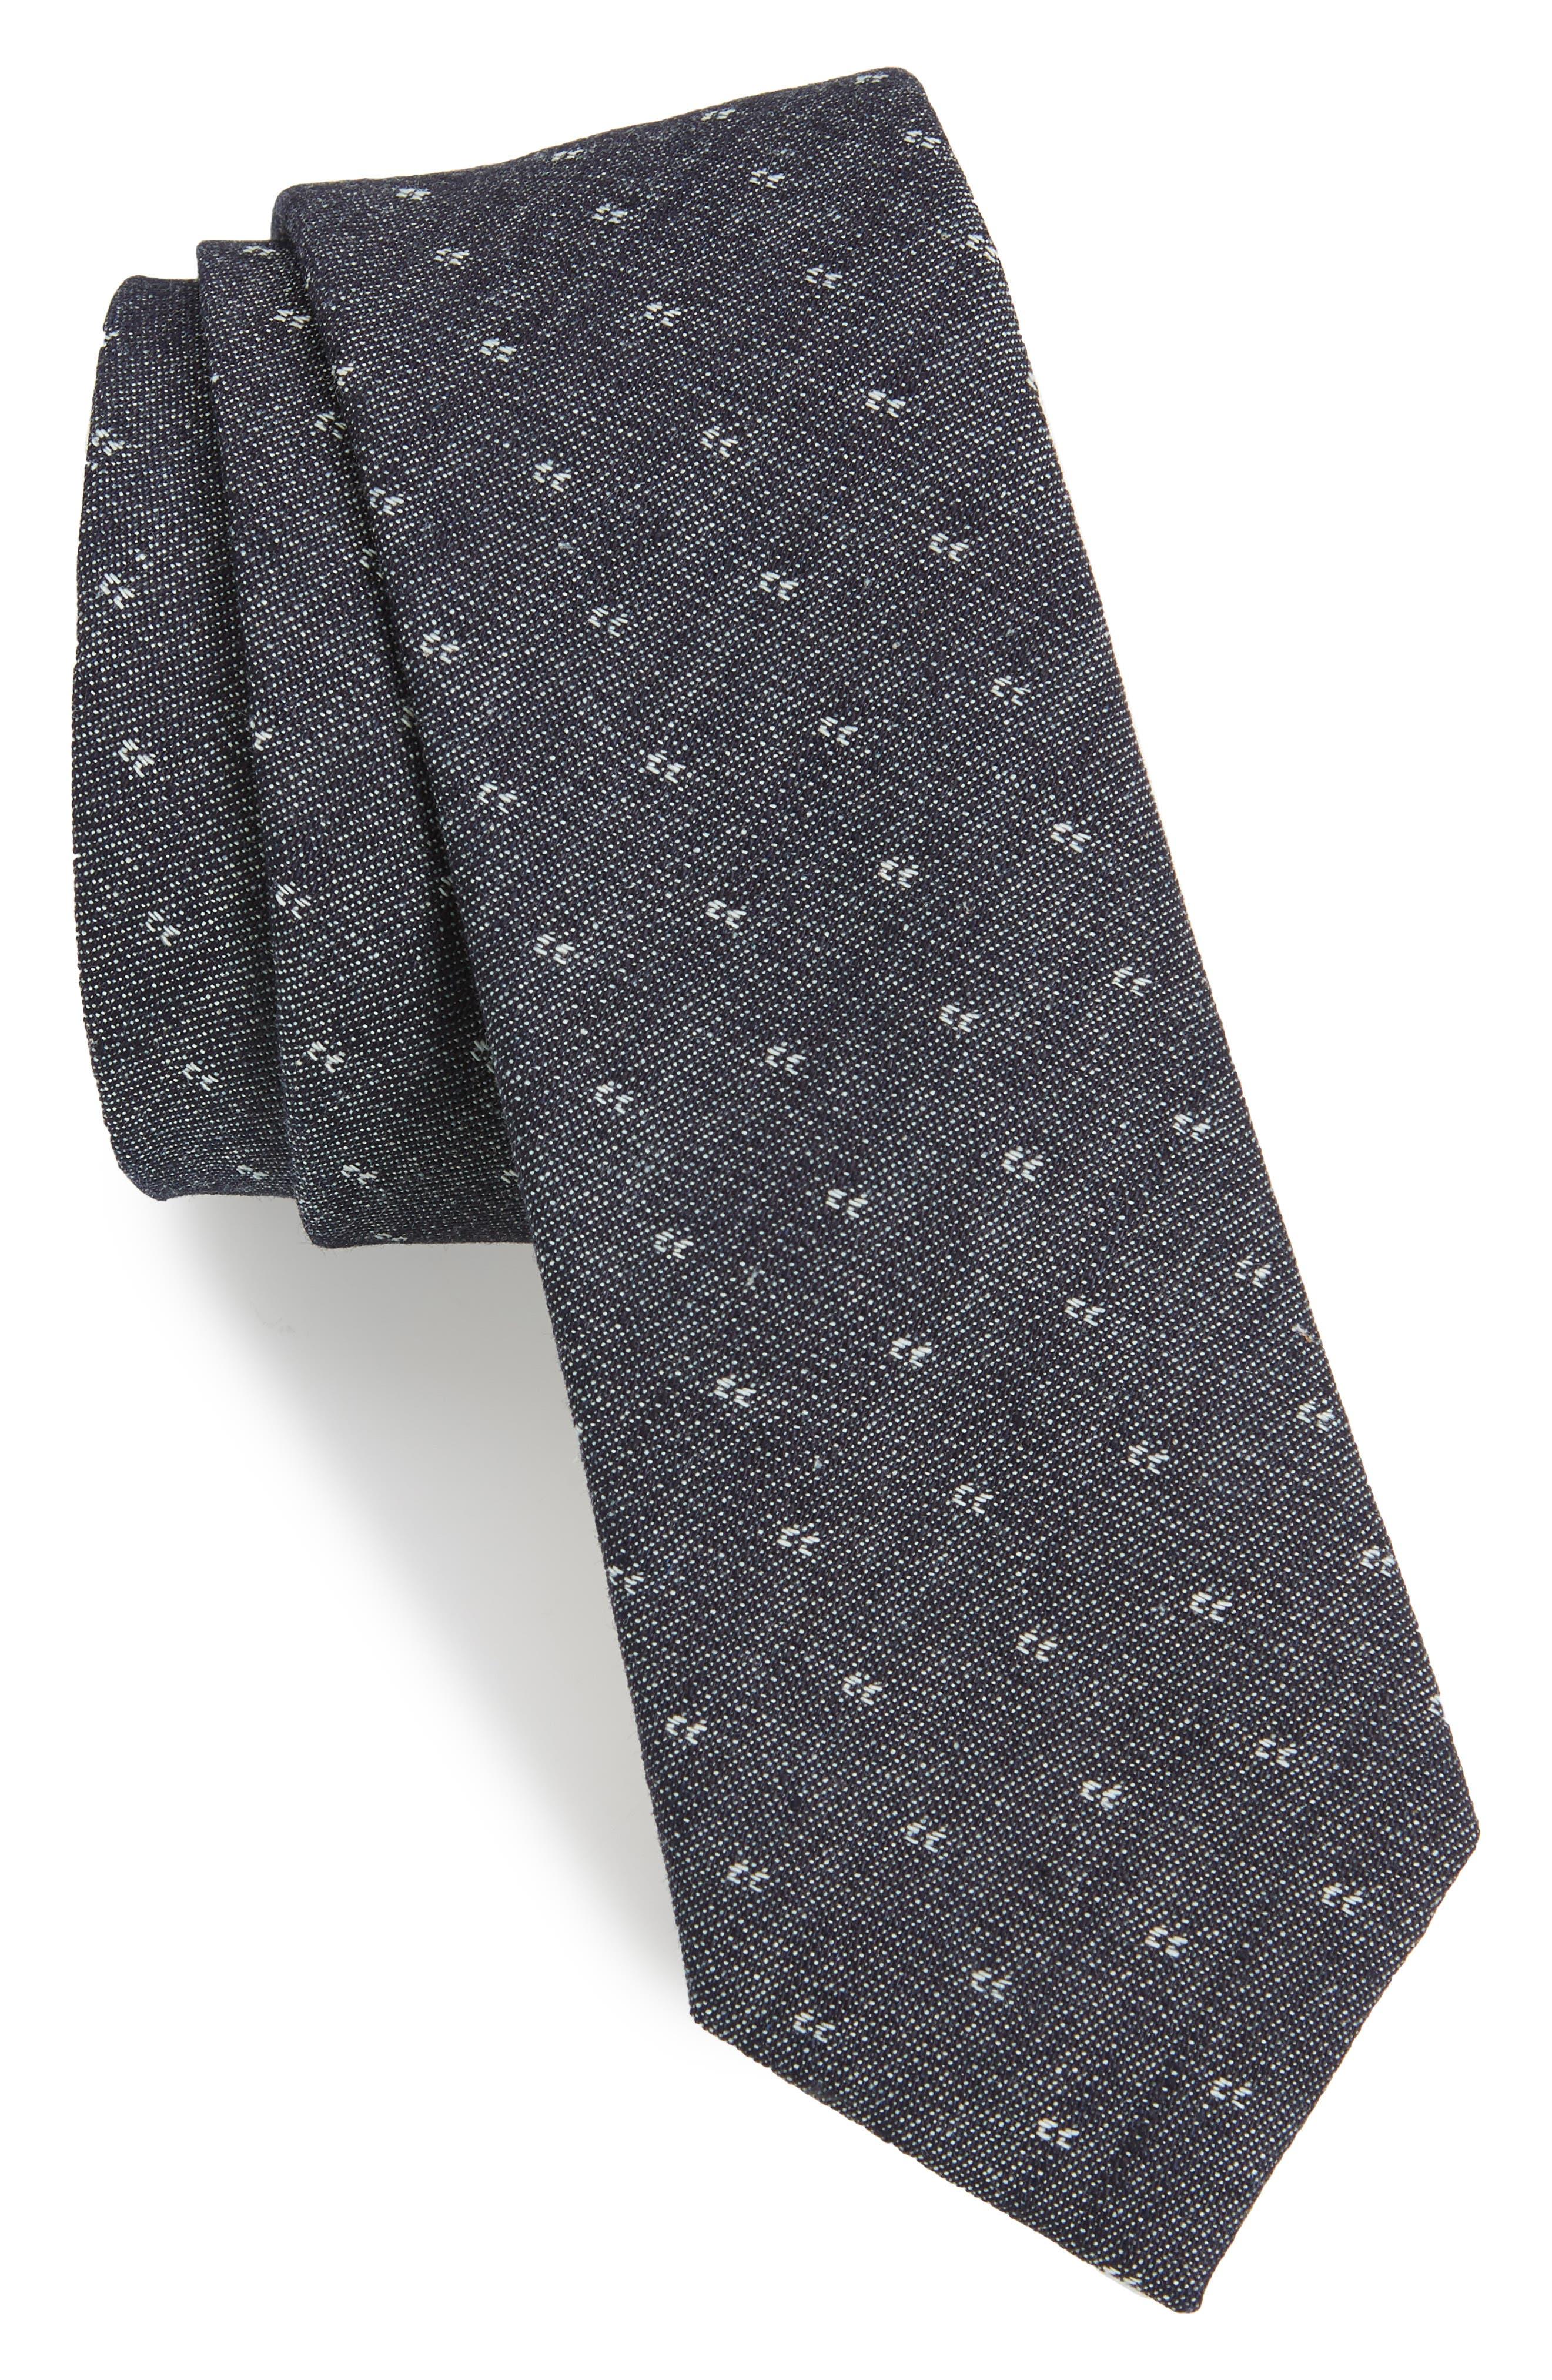 The Tie Bar Geometric Cotton Tie